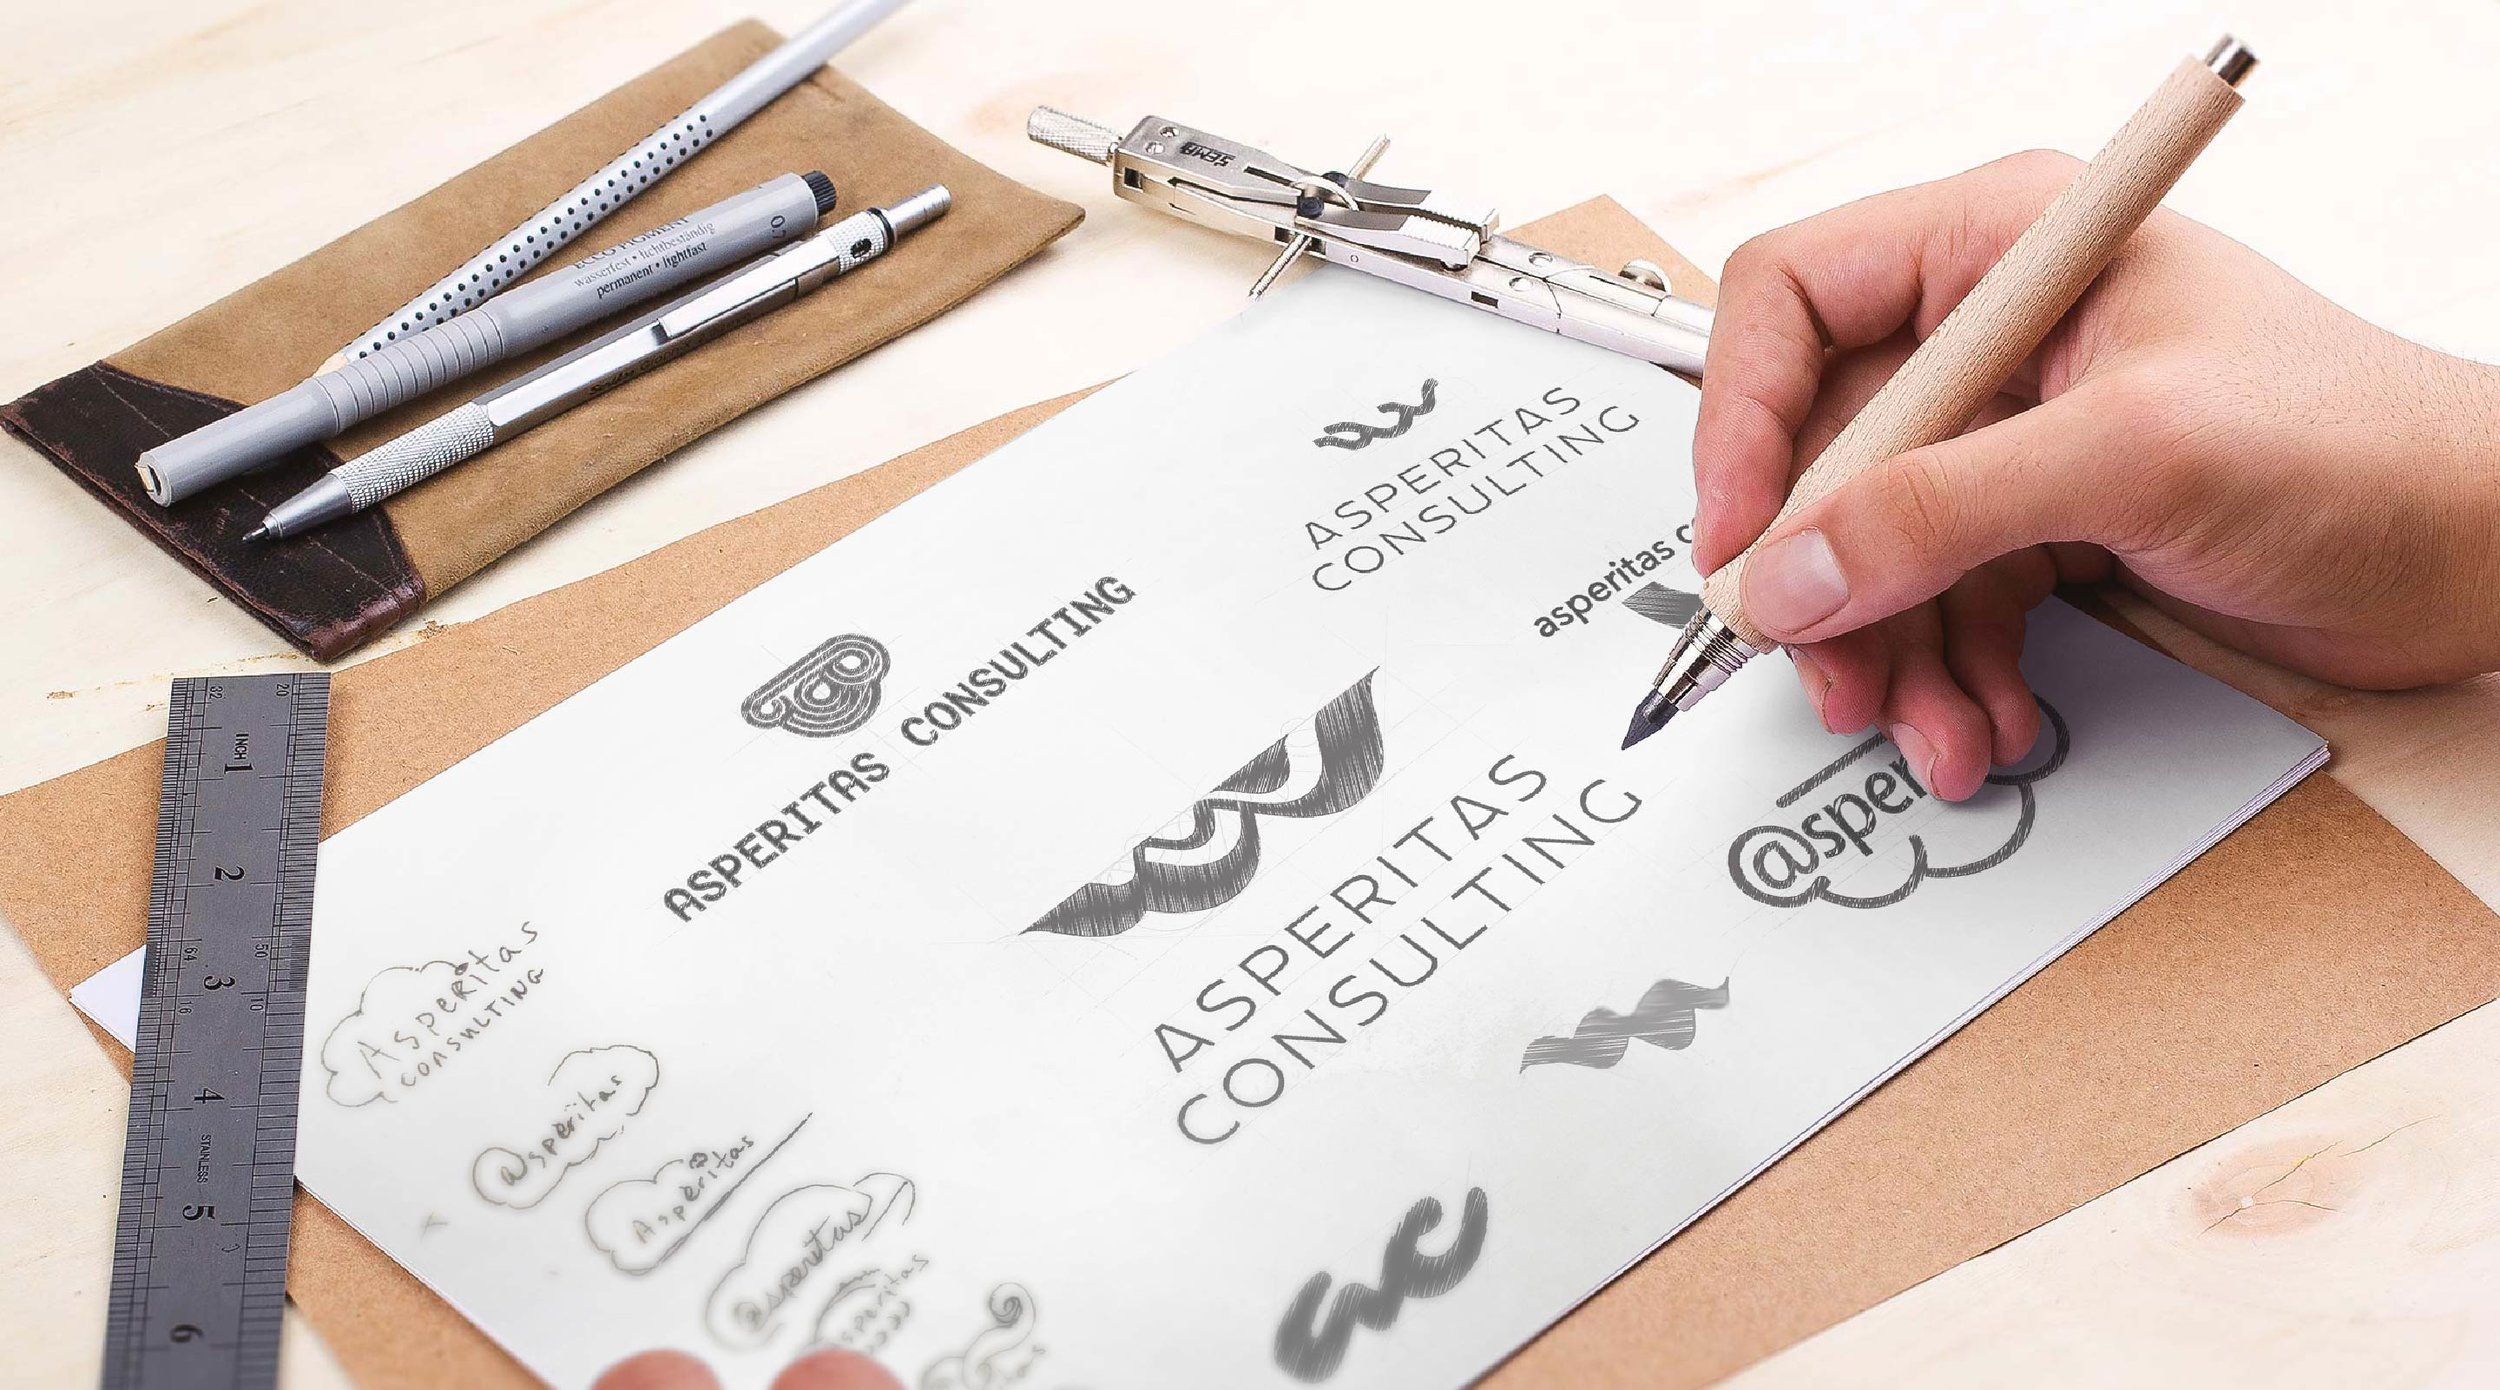 concept Asperitas cloud sercurity storage consulting brand logo stationary graphic design.jpg